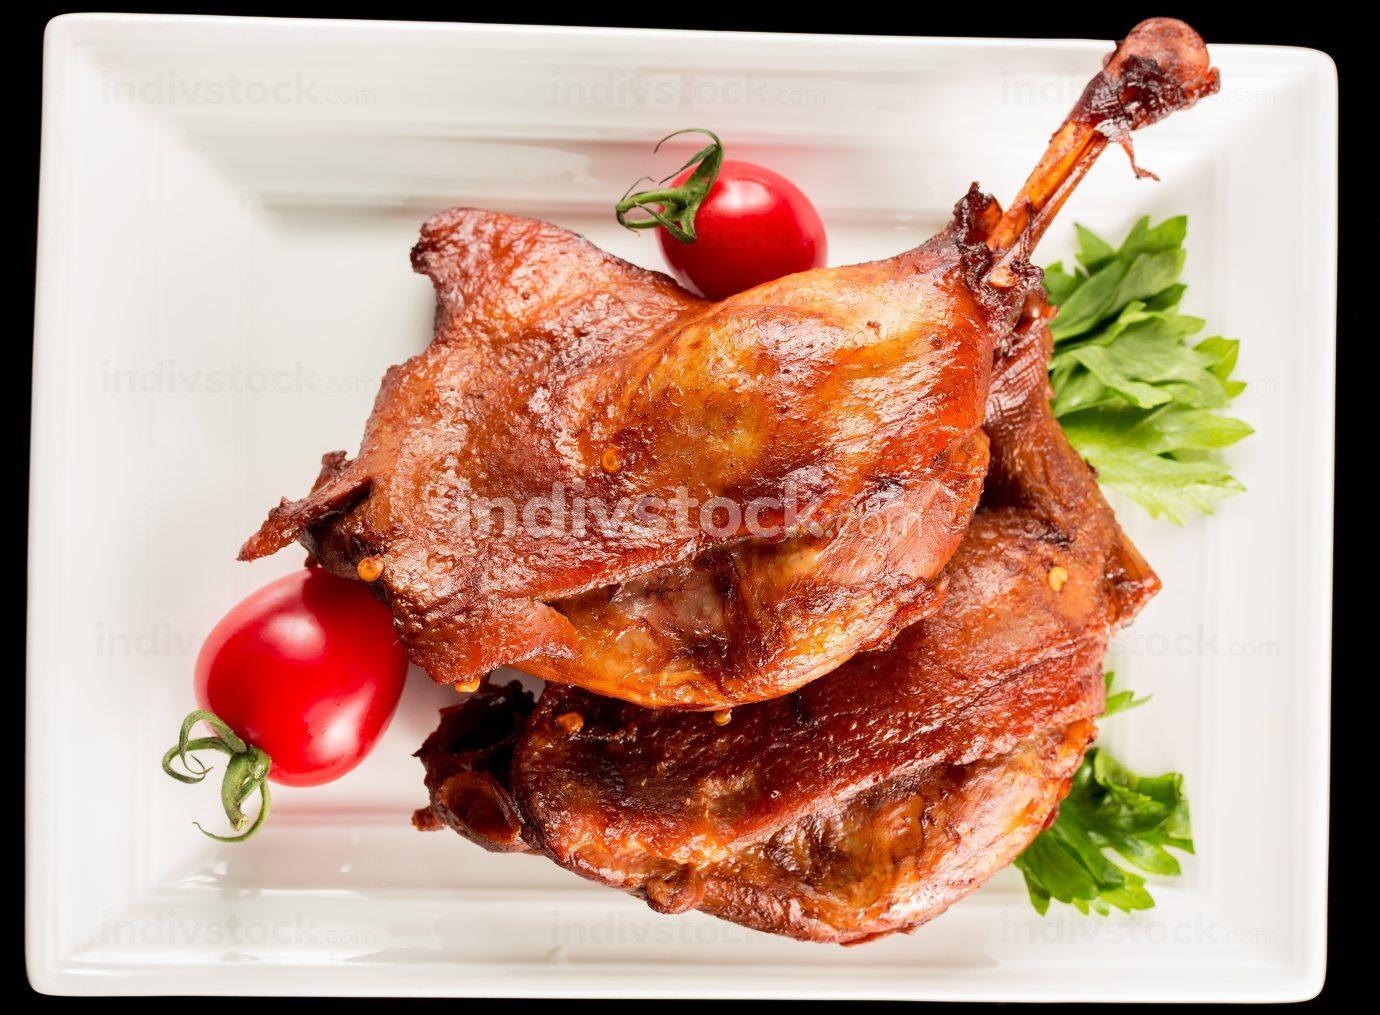 Braised duck legs, Chinese cuisine.